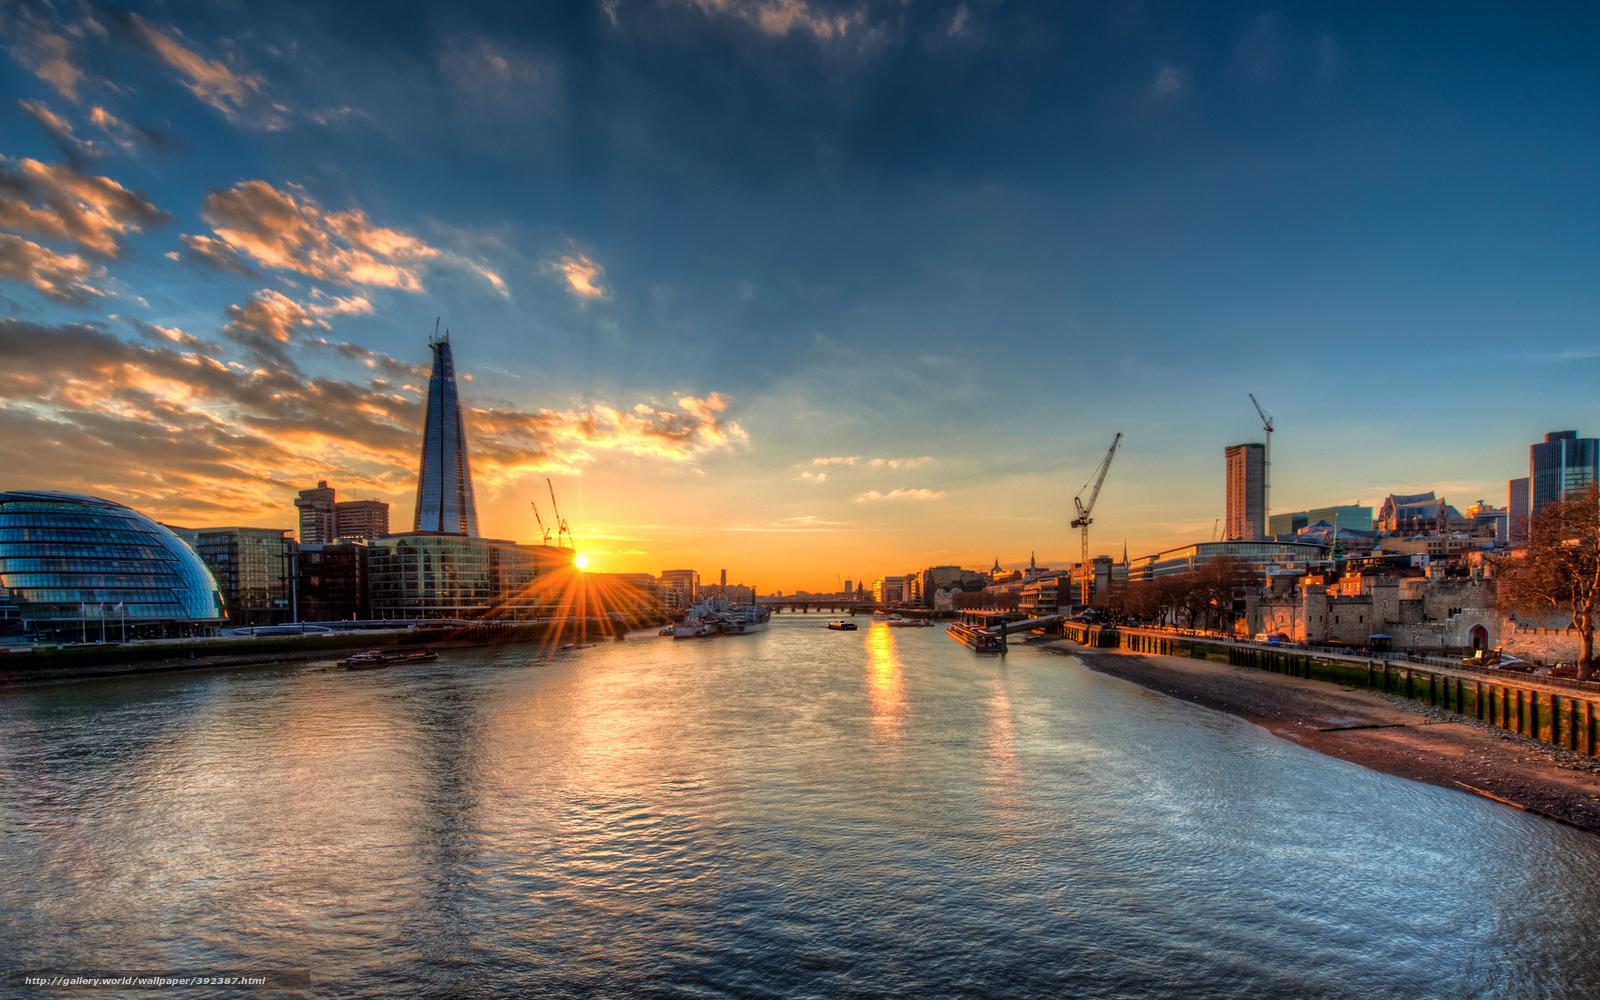 Download wallpaper London, England, sunset free desktop wallpaper in ...